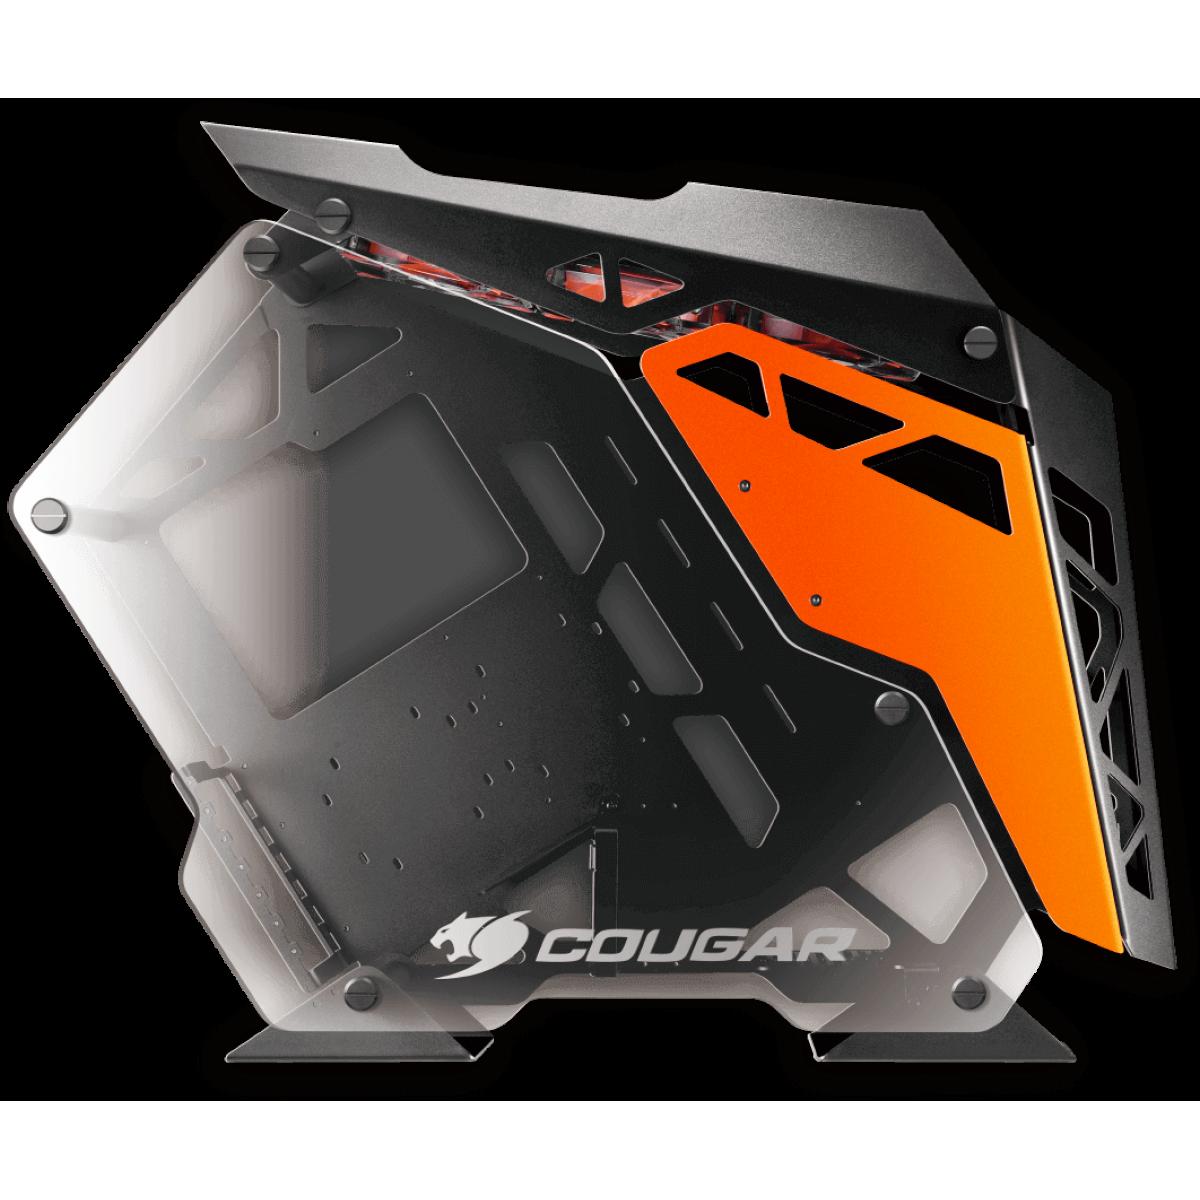 Gabinete Gamer Cougar Conquer 385LMR0.0001 Vidro Temperado Mid Tower Preto Sem Fonte